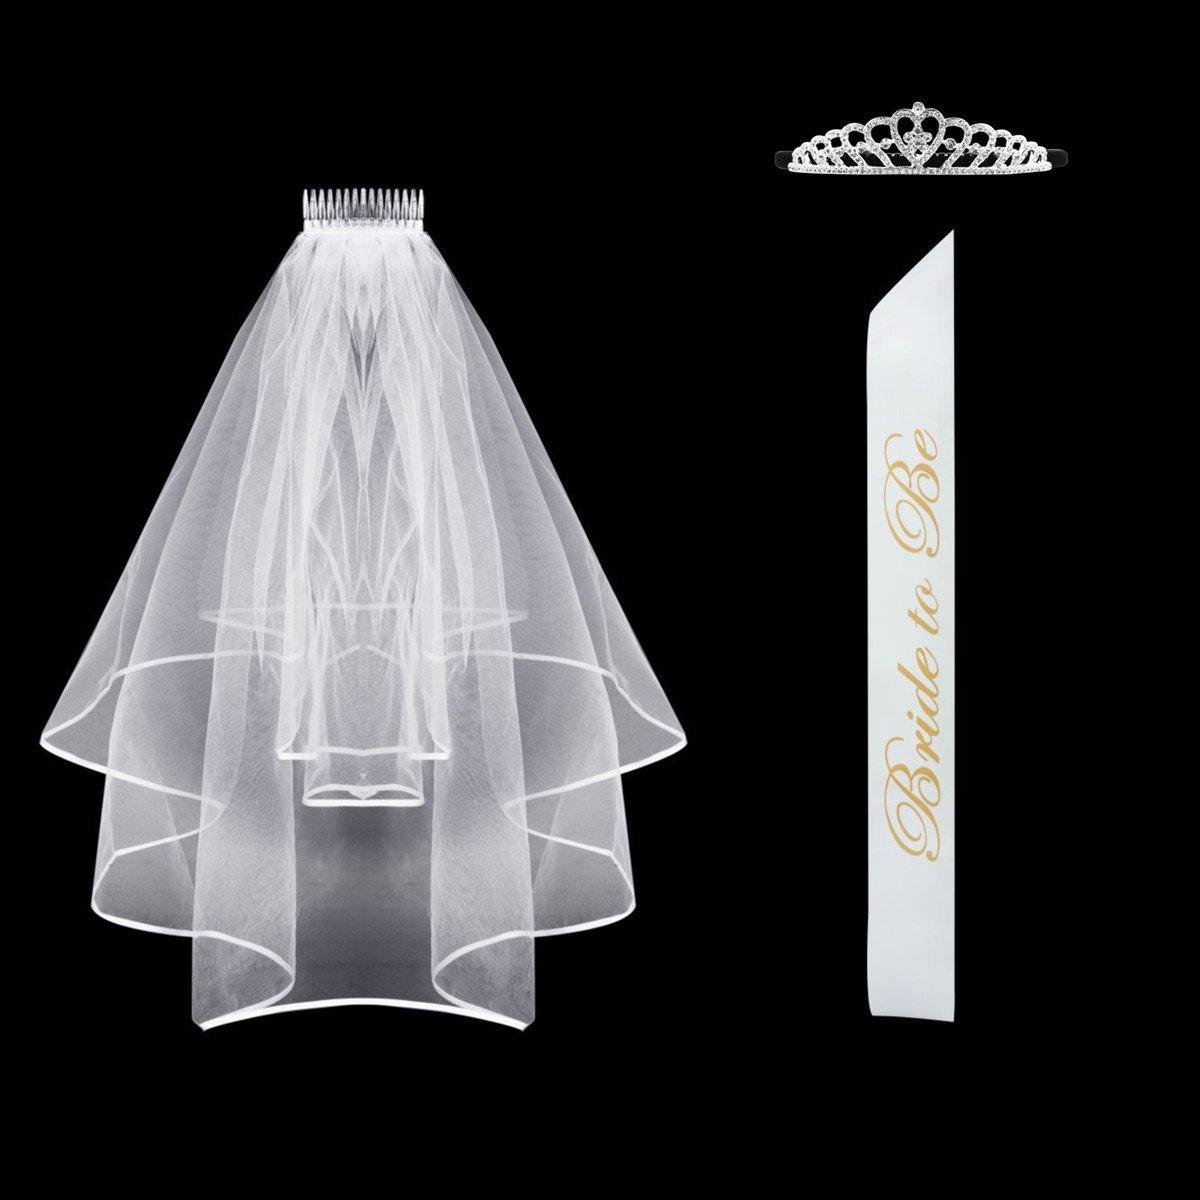 Bachelorette Party Bride To Be Sash Satin & Rhinestone Tiara Crown & Bridal Veil Girls Night Out Game … (Satin) by Supoice